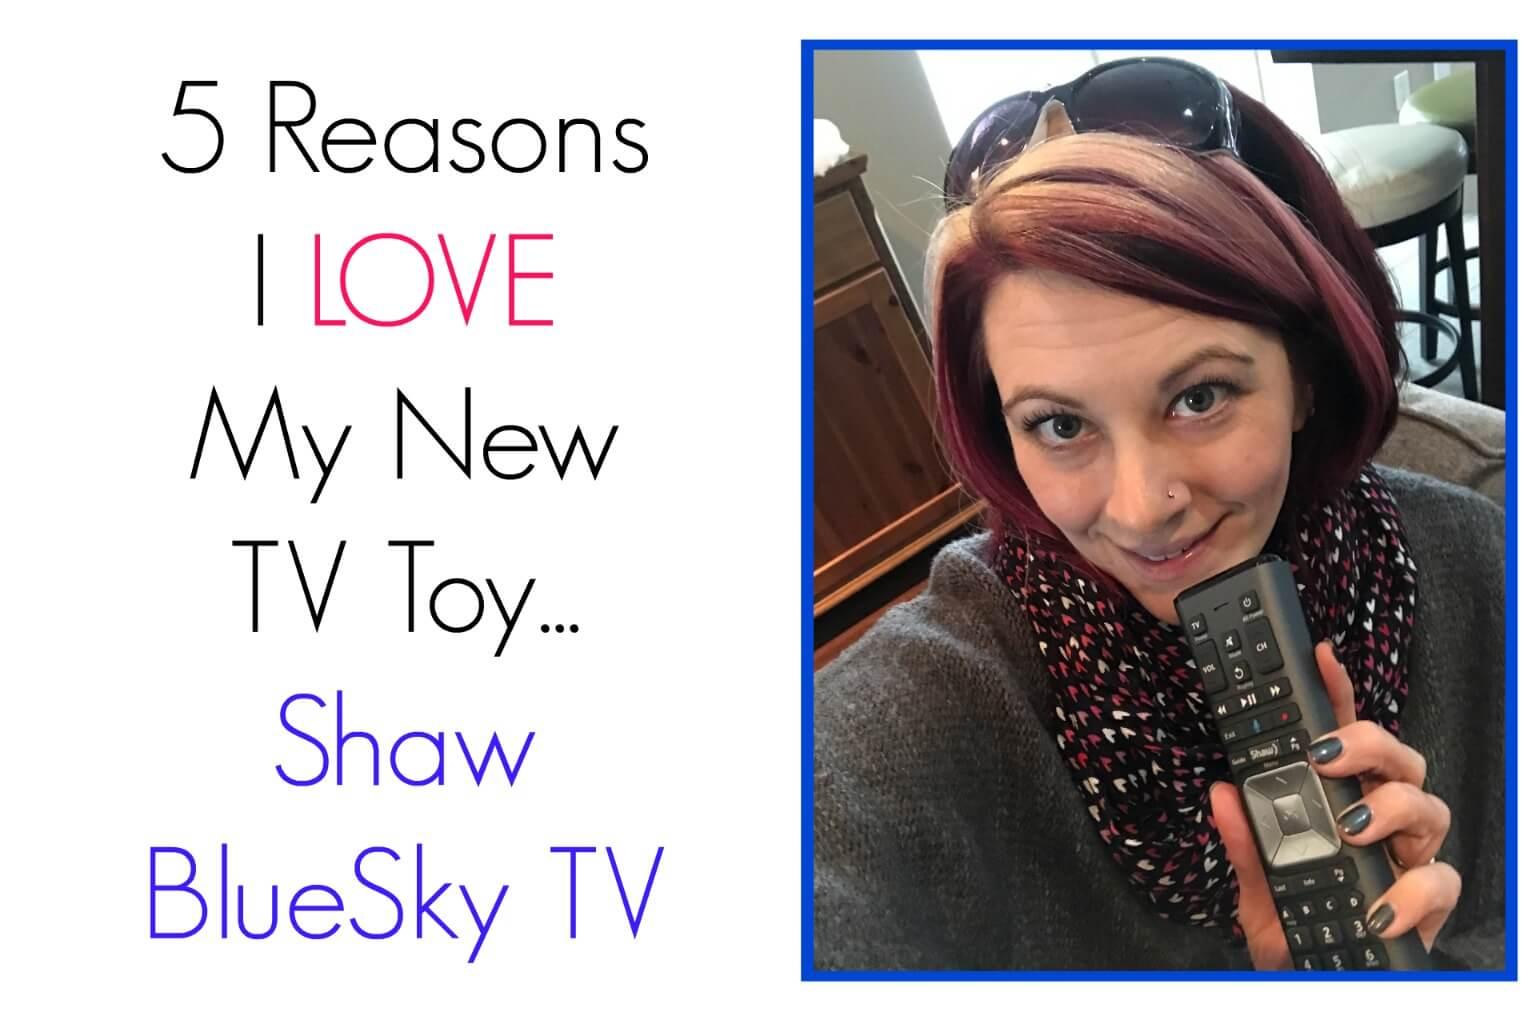 5 Reasons I LOVE My New TV Toy! – Shaw BlueSky TV